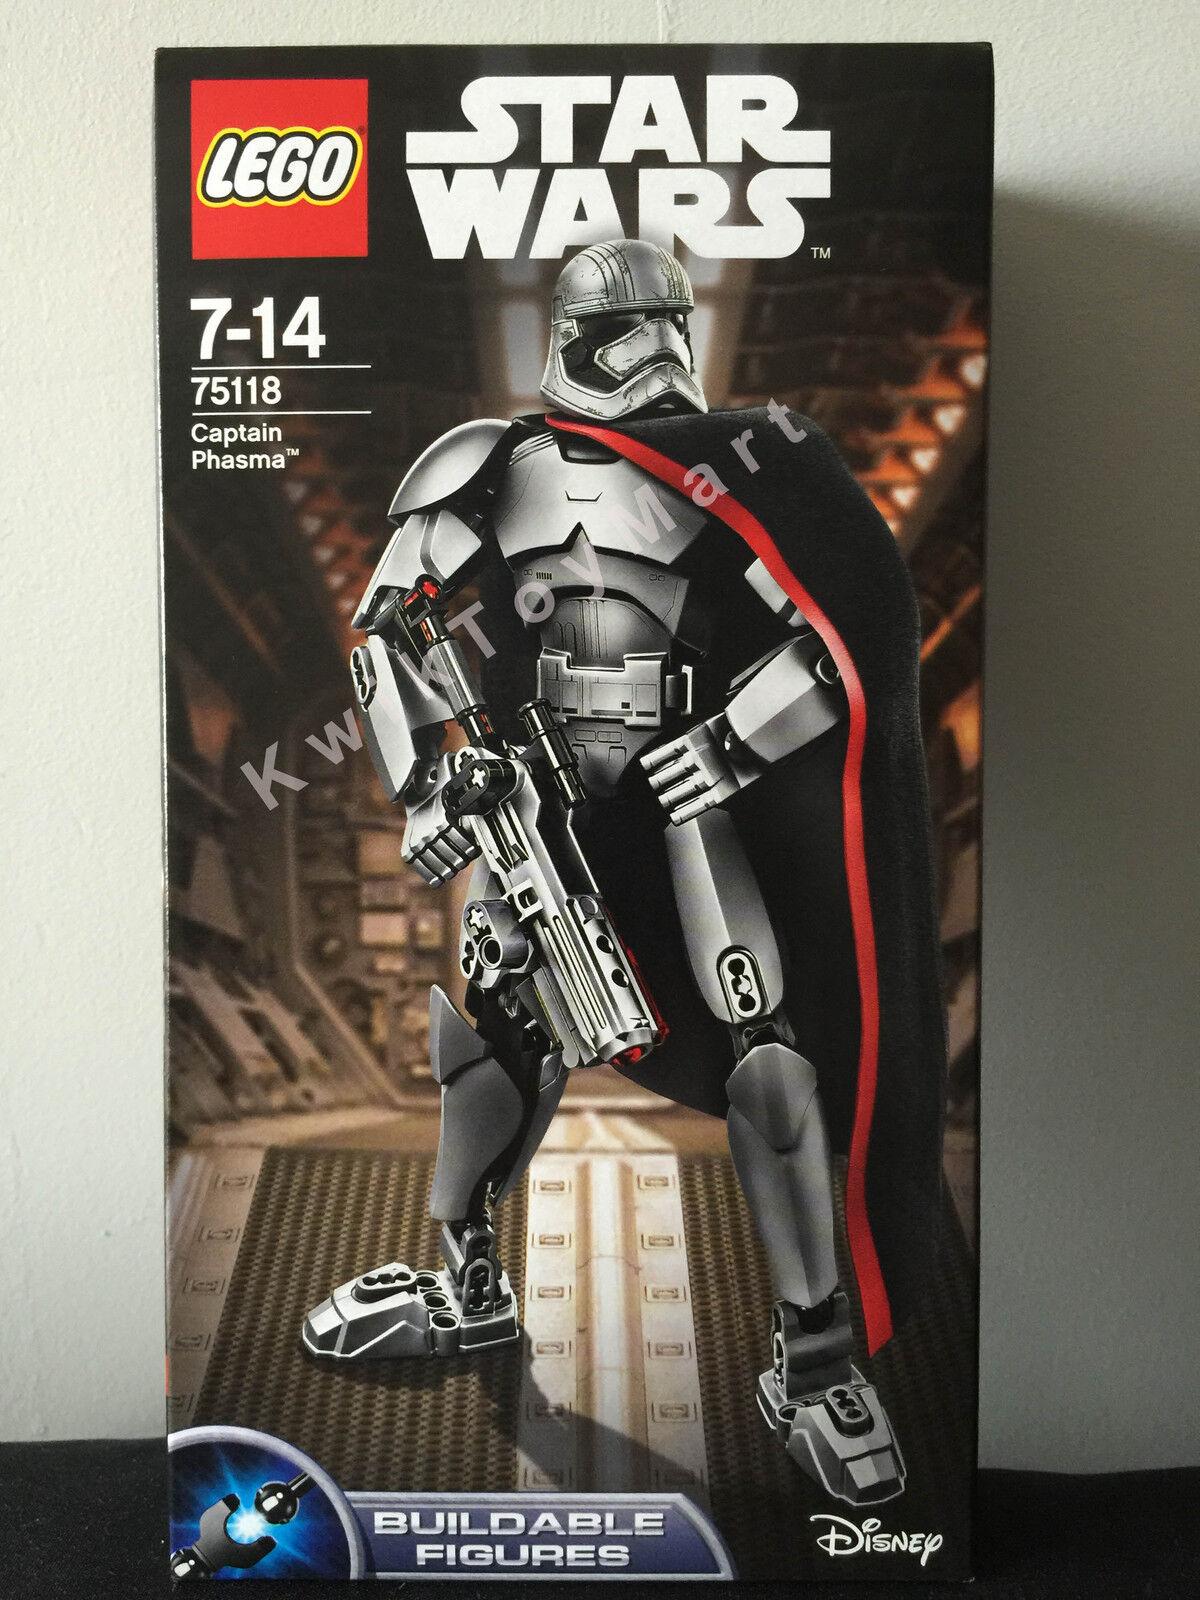 LEGO Star Wars CAPTAIN PHASMA  75118 Buildable Figures 26 CM RARE